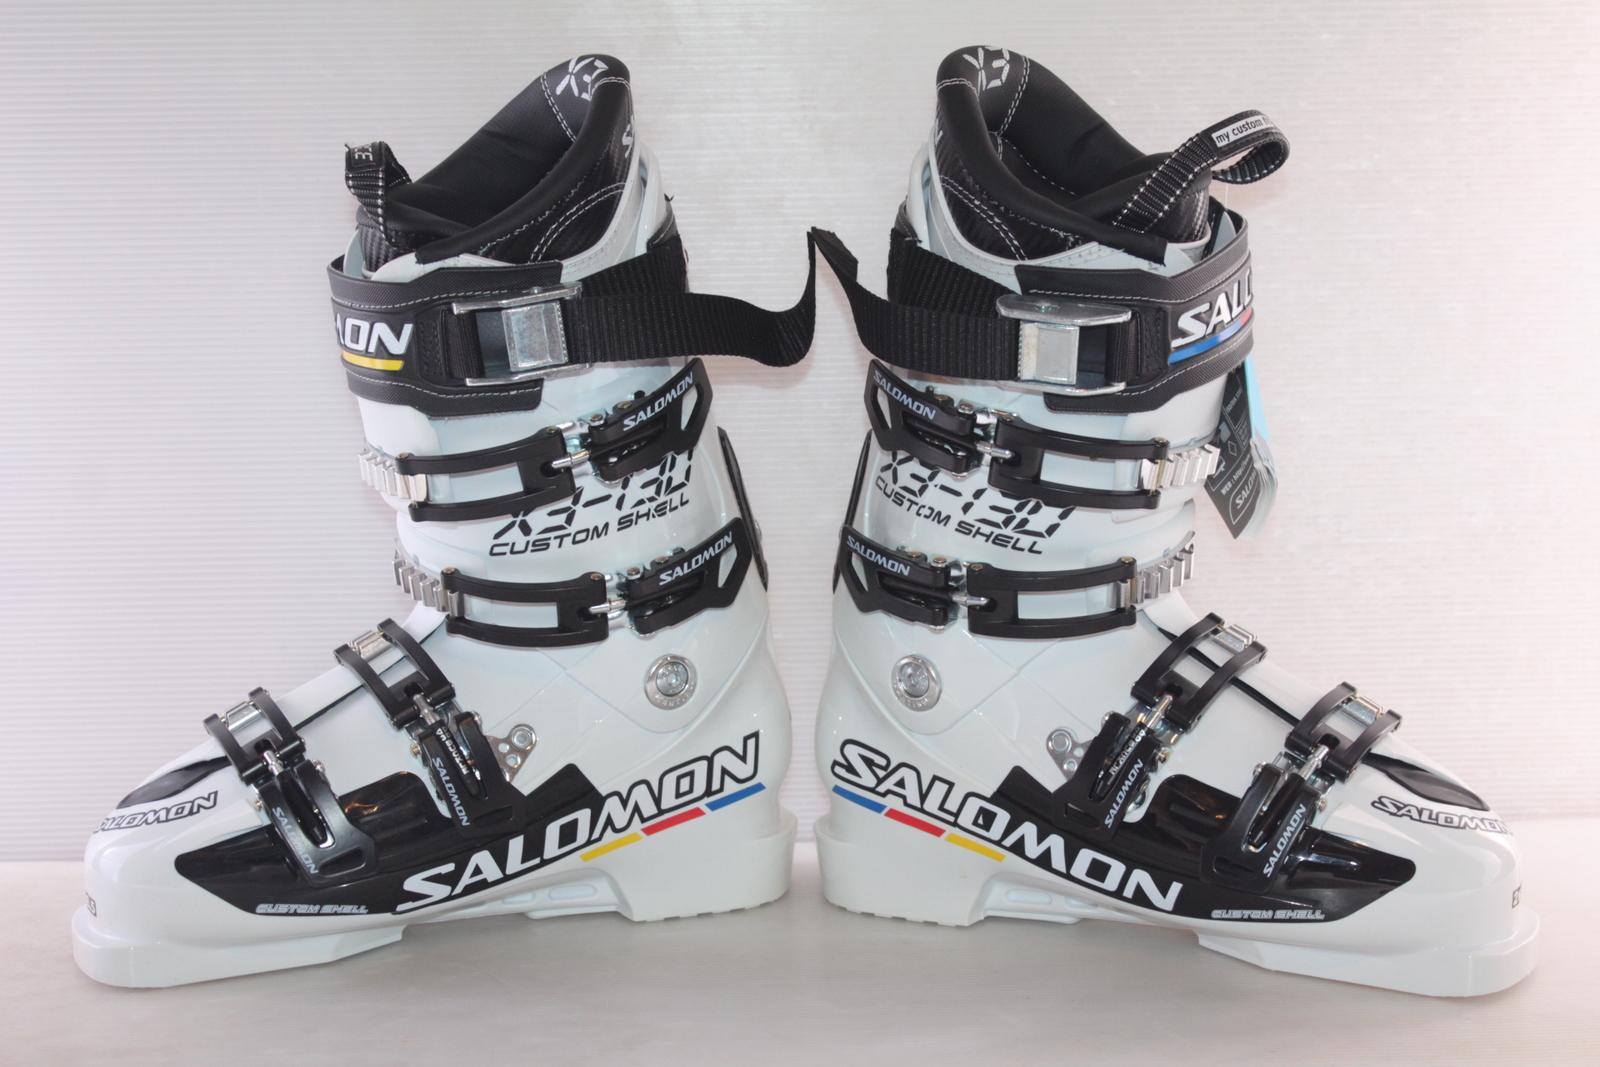 Lyžařské boty Salomon X3-130 vel. EU41 flexe 130